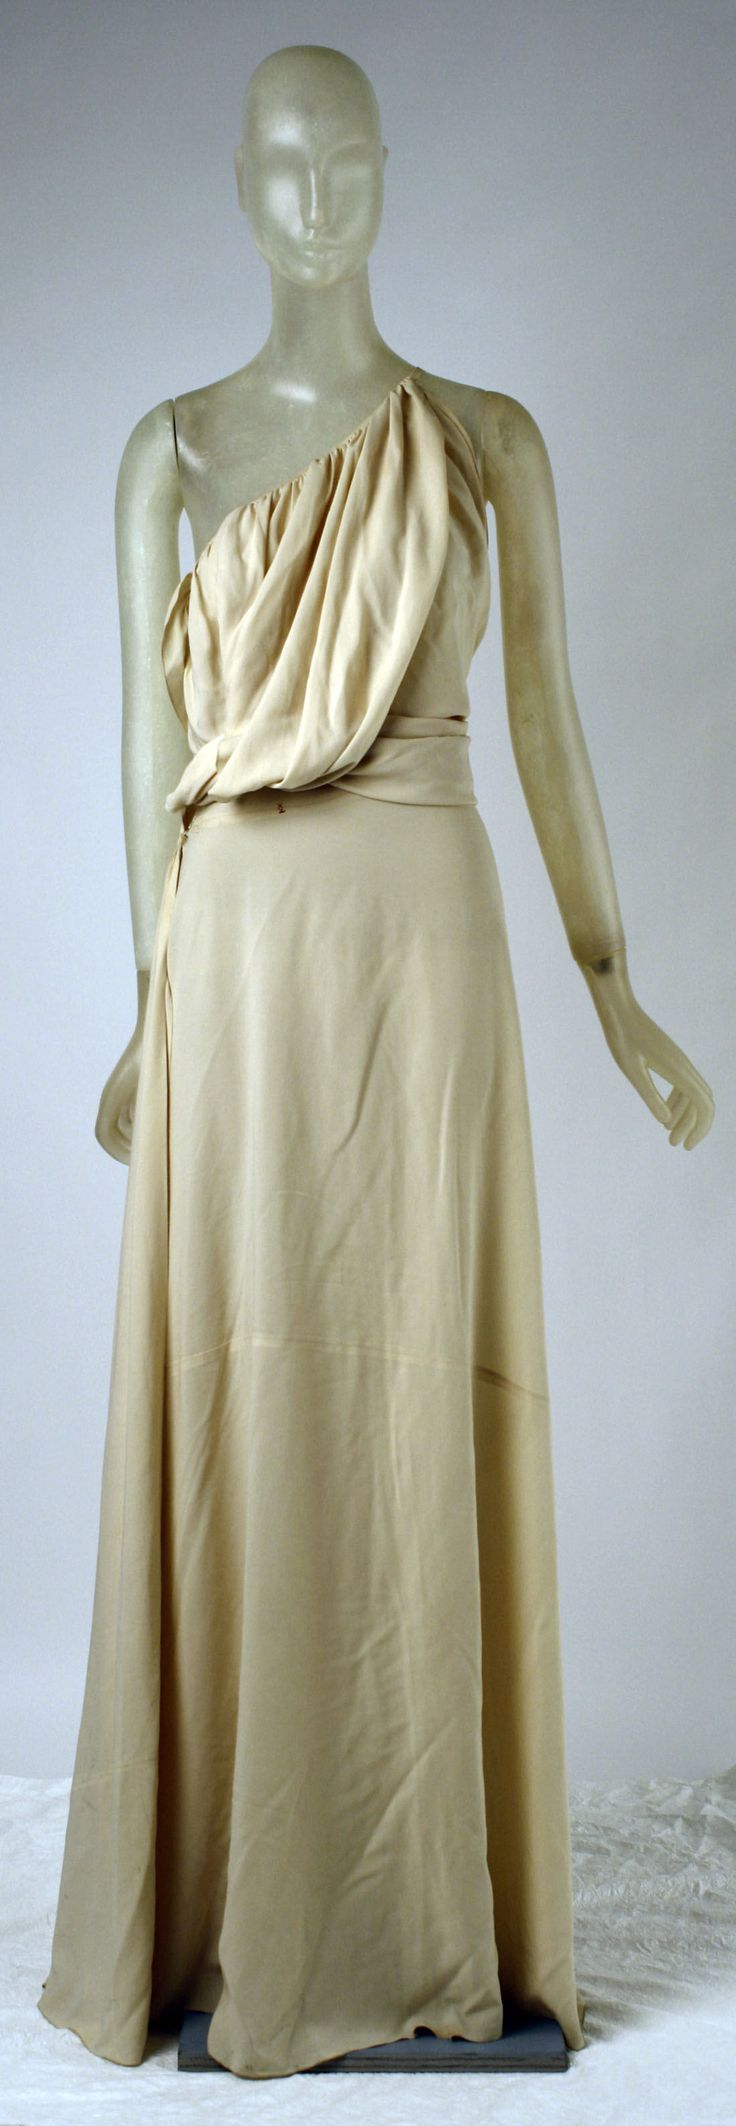 Evening Dress, Madeleine Vionnet (French, Chilleurs-aux-Bois 1876–1975 Paris): spring/summer 1937, French, silk.